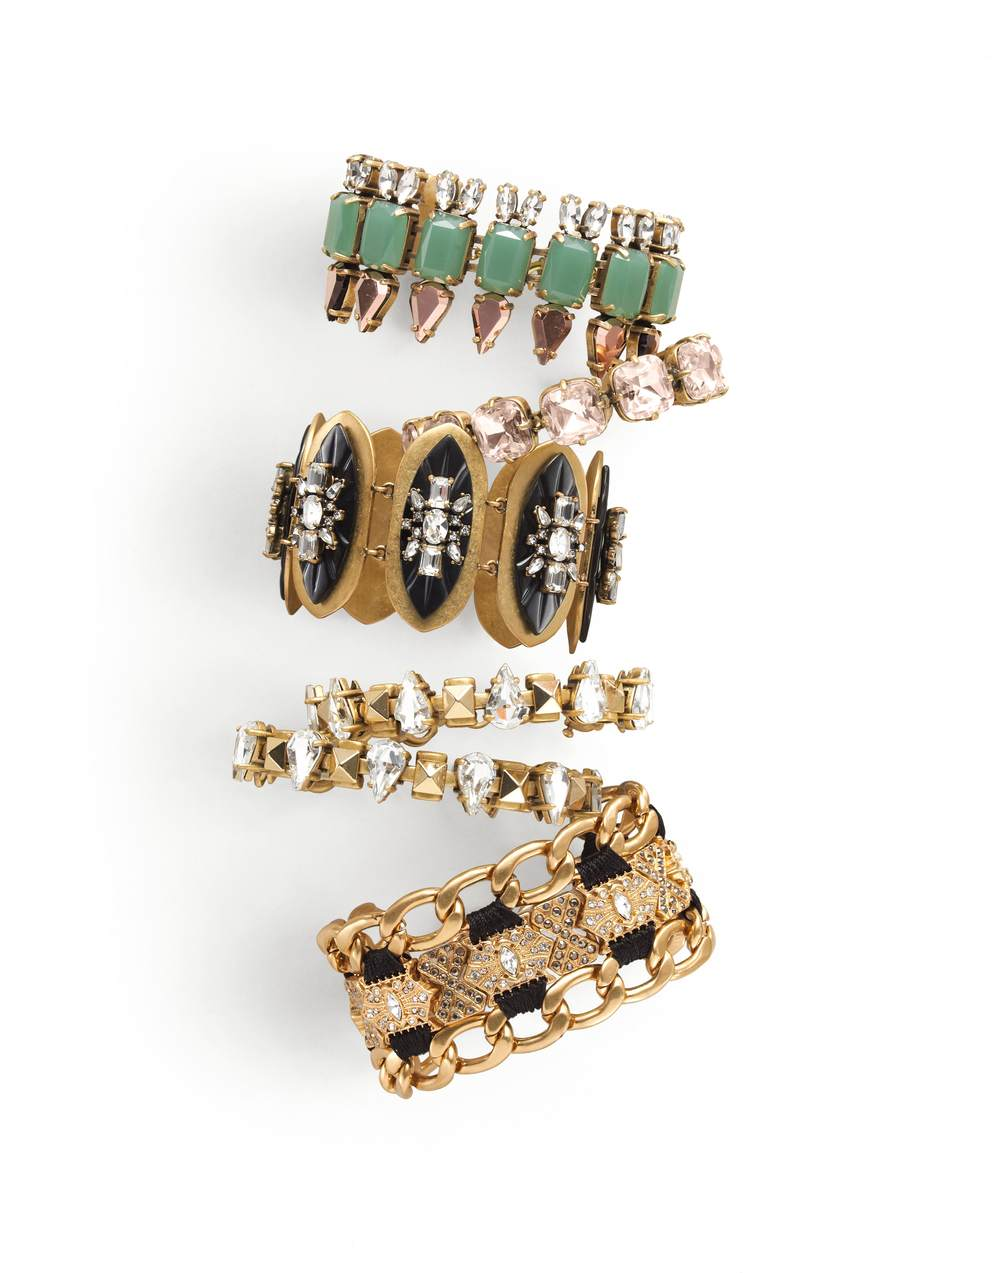 Jcrew_catalog_jewelryphotography.jpg